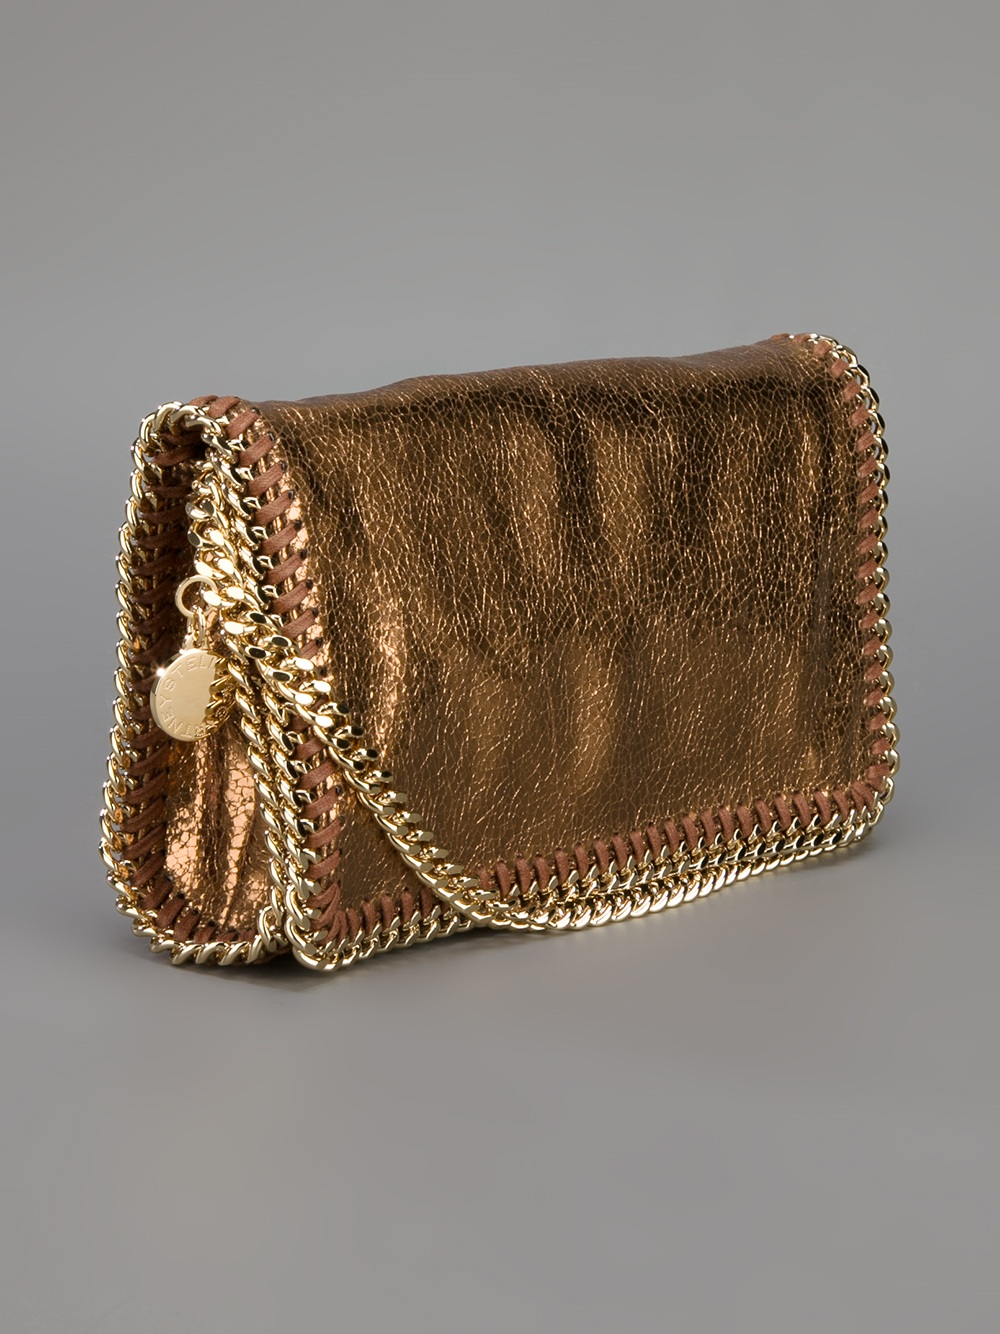 Stella McCartney Metallic Crackle Falabella Bag in Brown - Lyst bb764c3166a0c